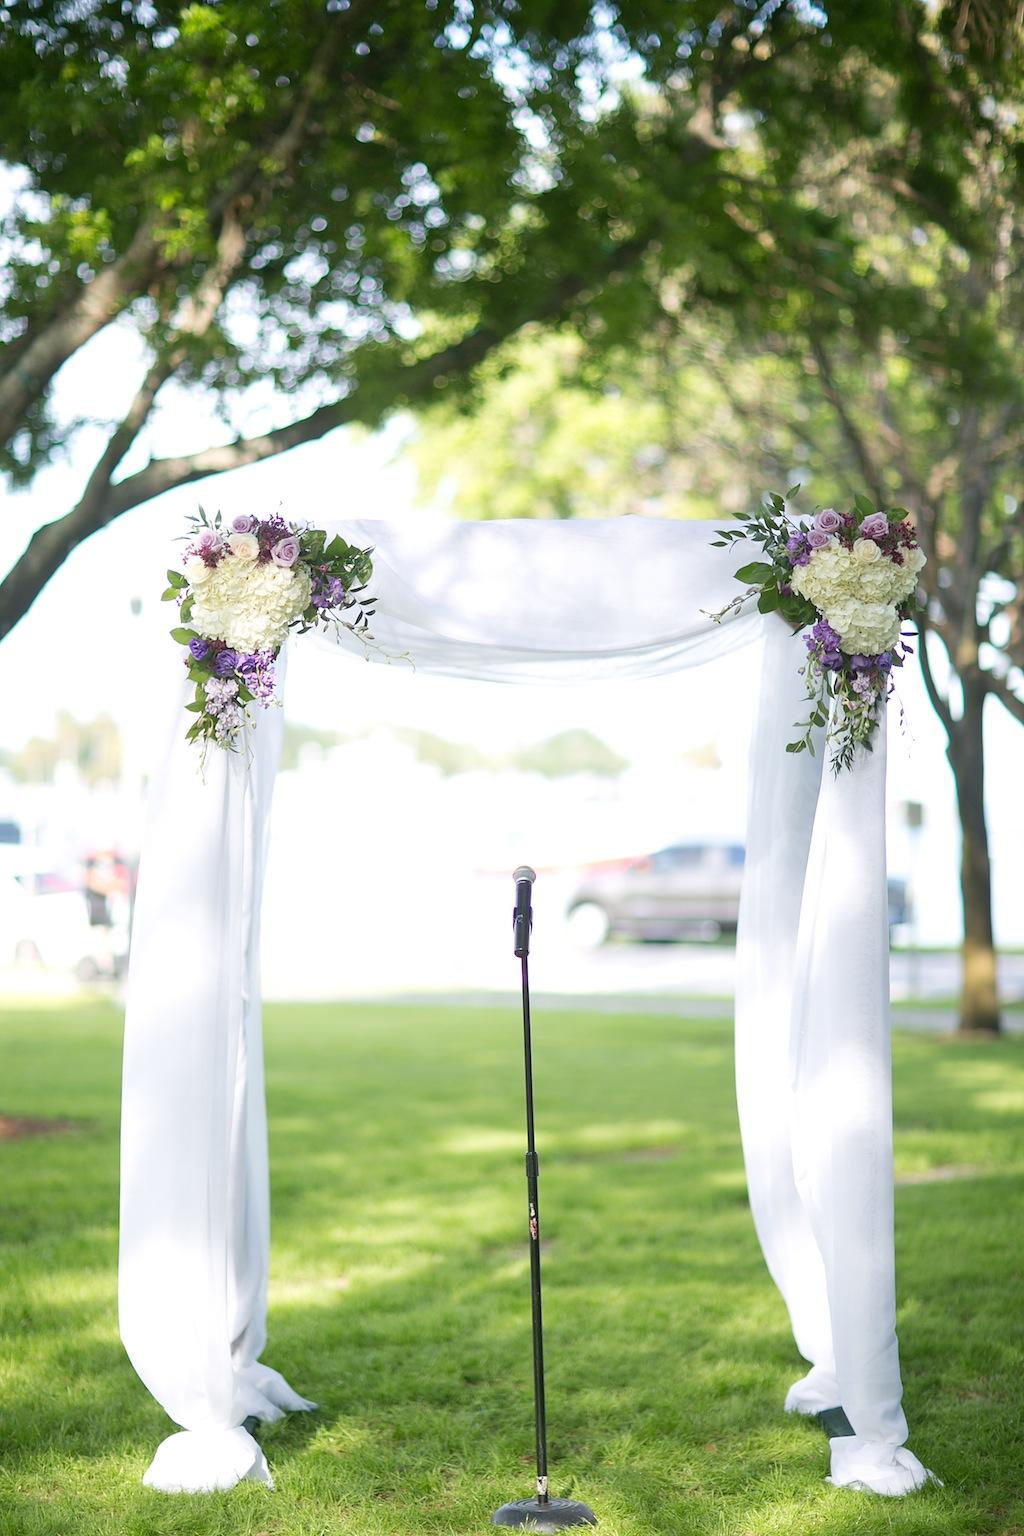 Downtown St. Pete Wedding - Birchwood Wedding - North Straub Park Wedding - Jenn Hopkins Photography (24)